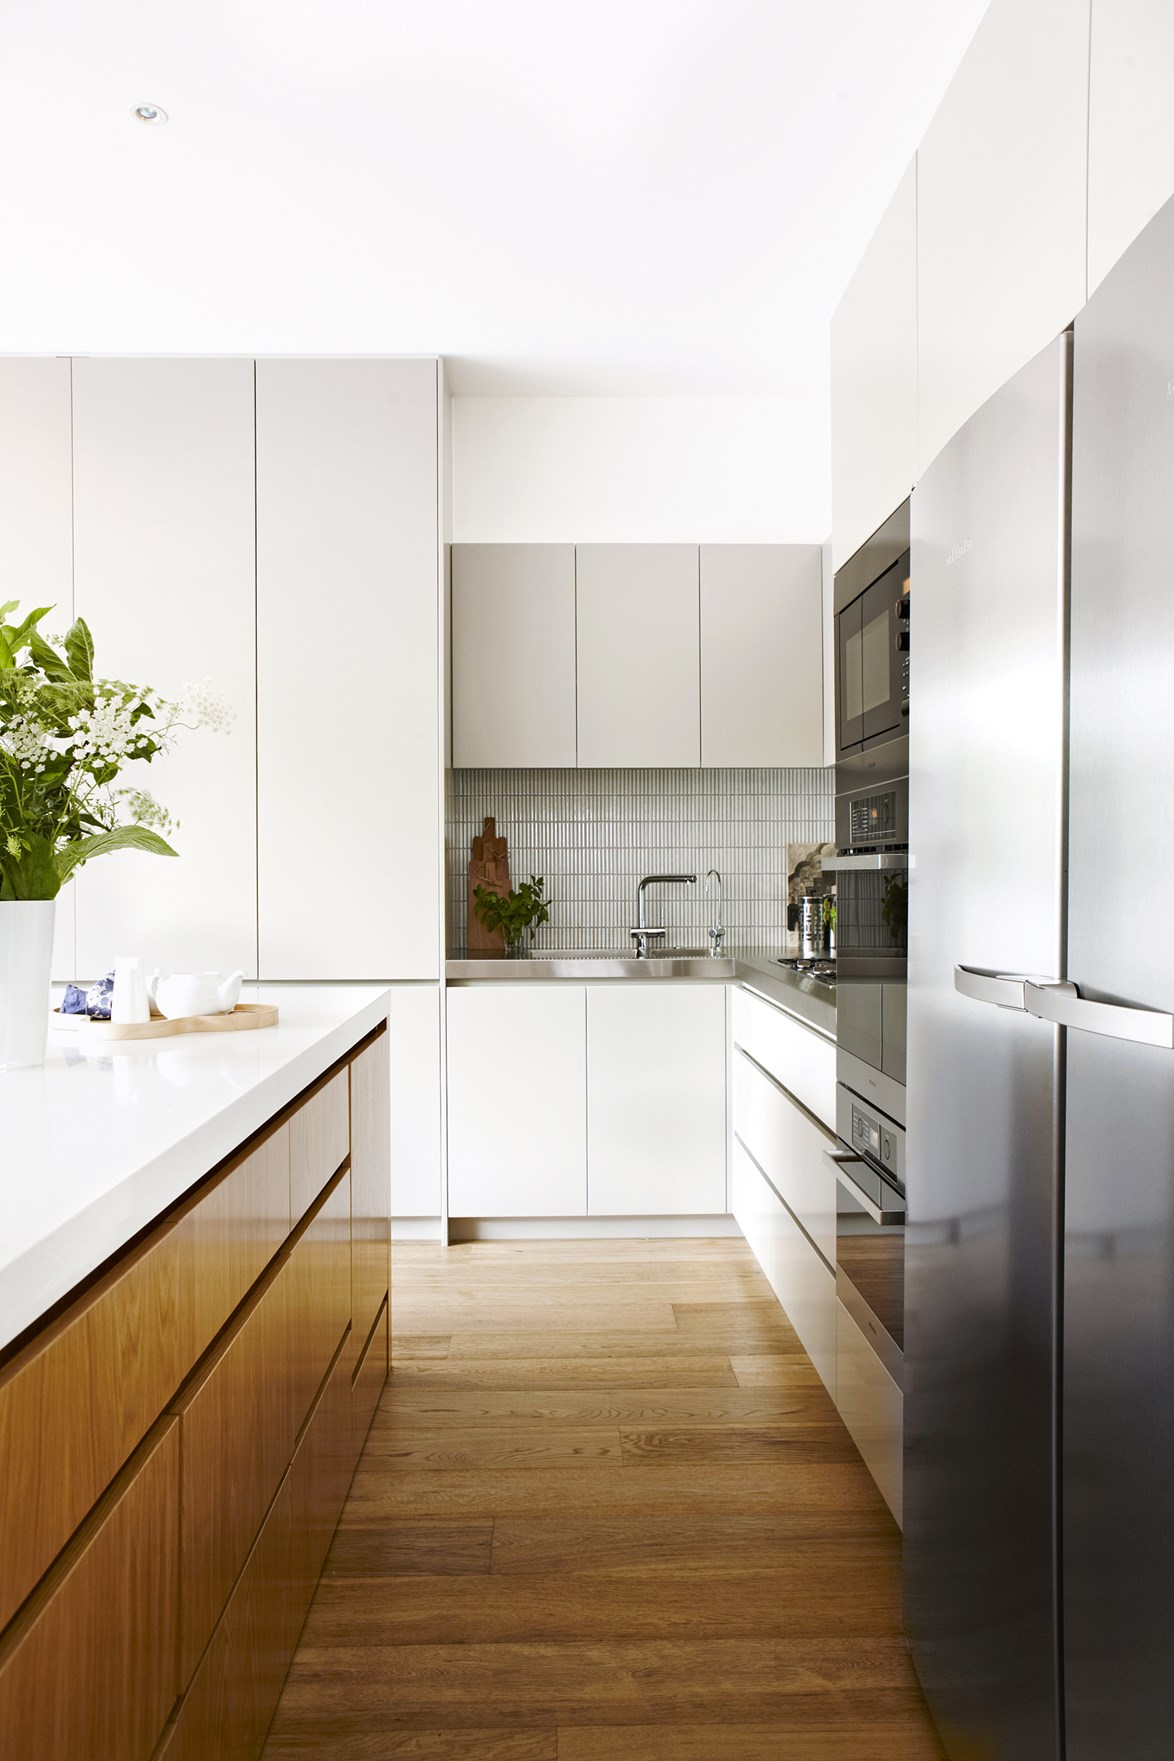 Kitchen cabinet door styles: 8 of the most popular ideas ...